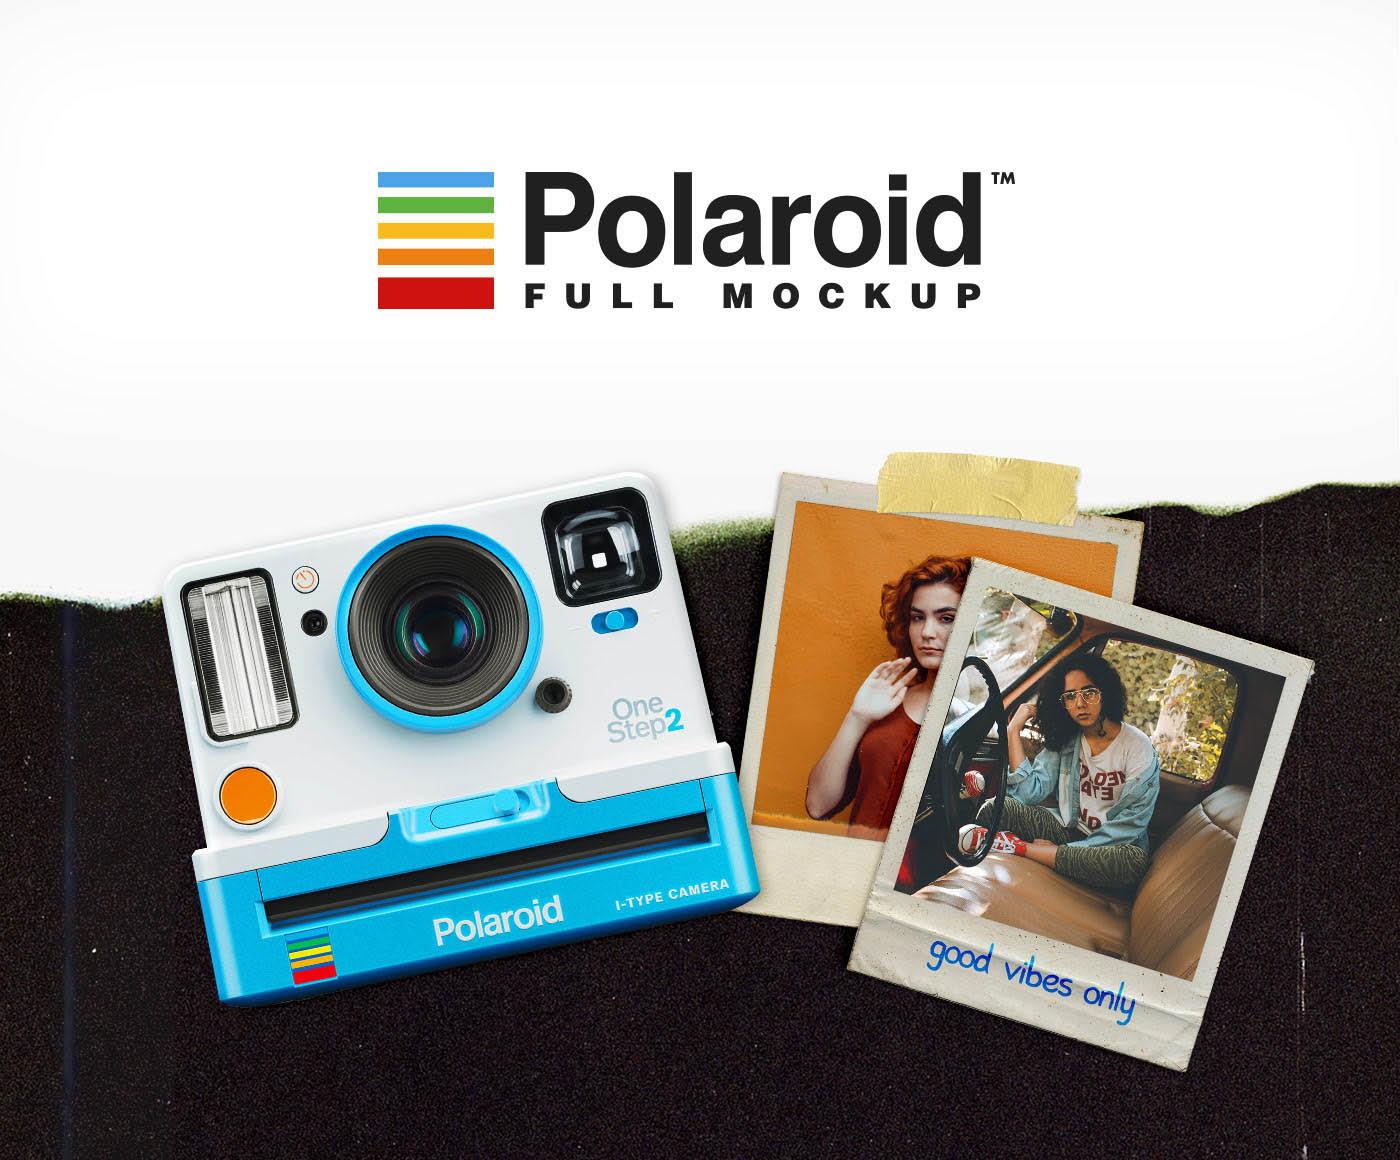 Free Polaroid Full Mockup скачать